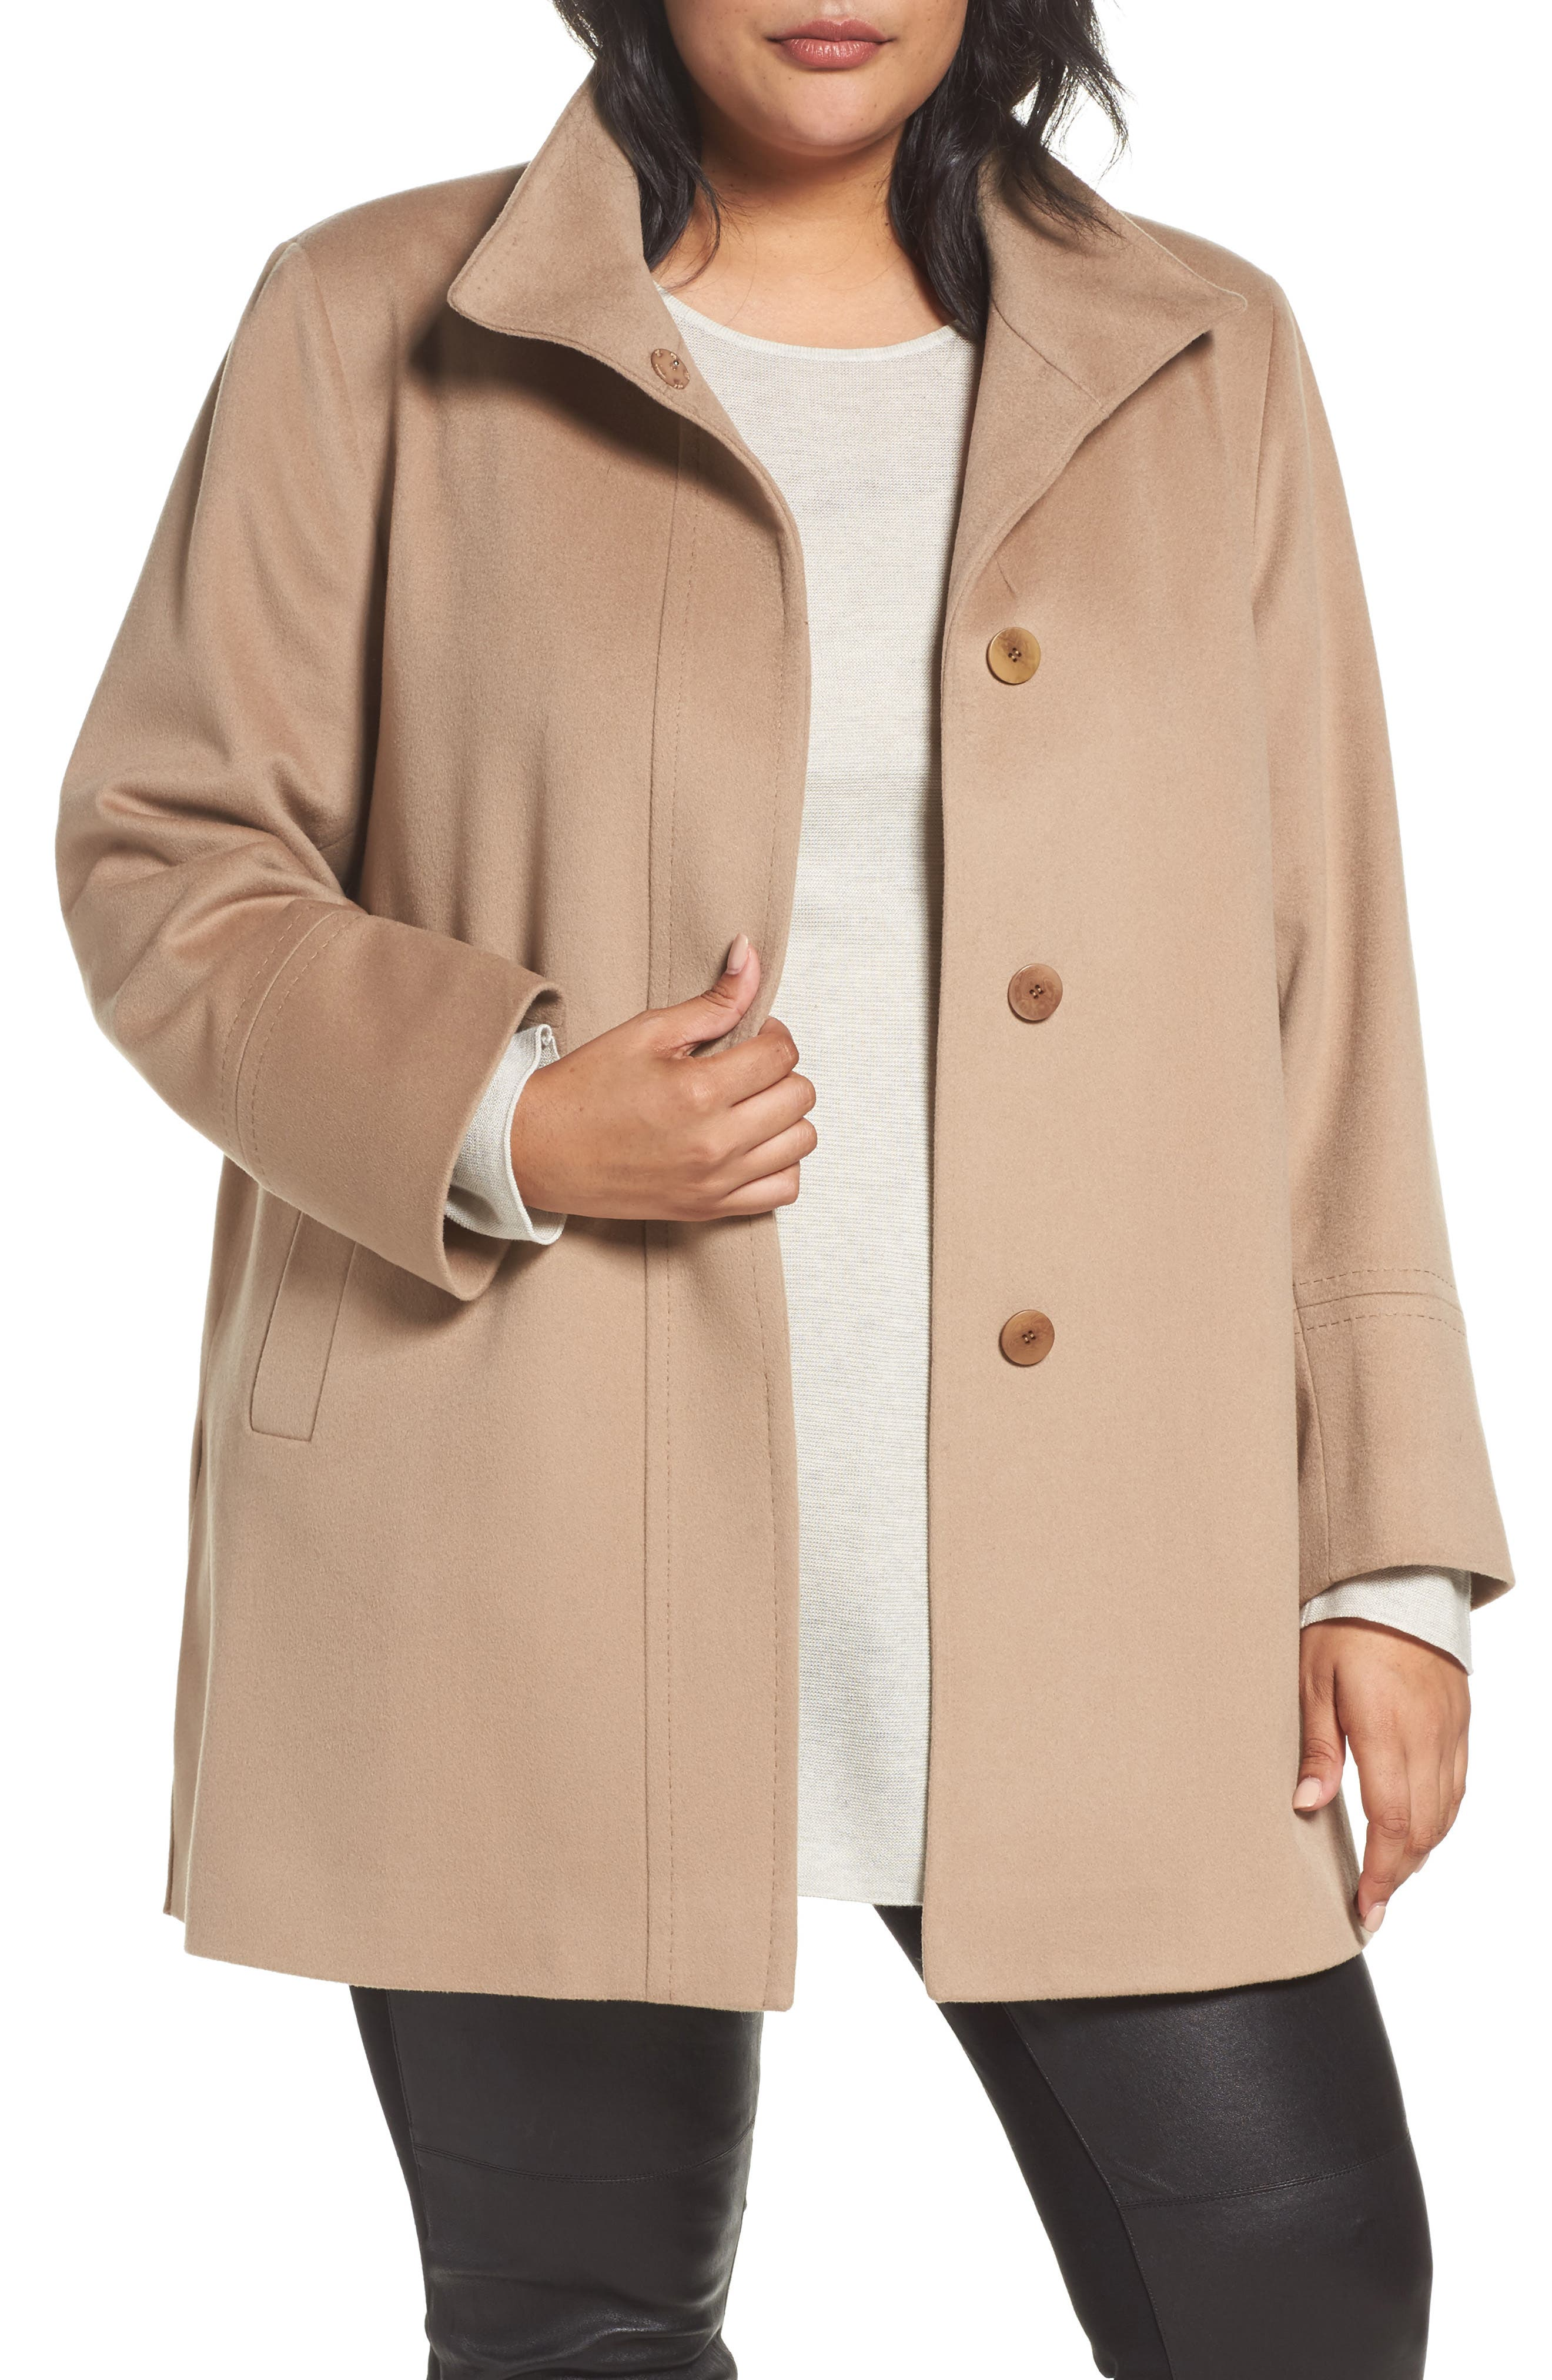 Alternate Image 1 Selected - Fleurette Wool Car Coat (Plus Size) (Nordstrom Exclusive)